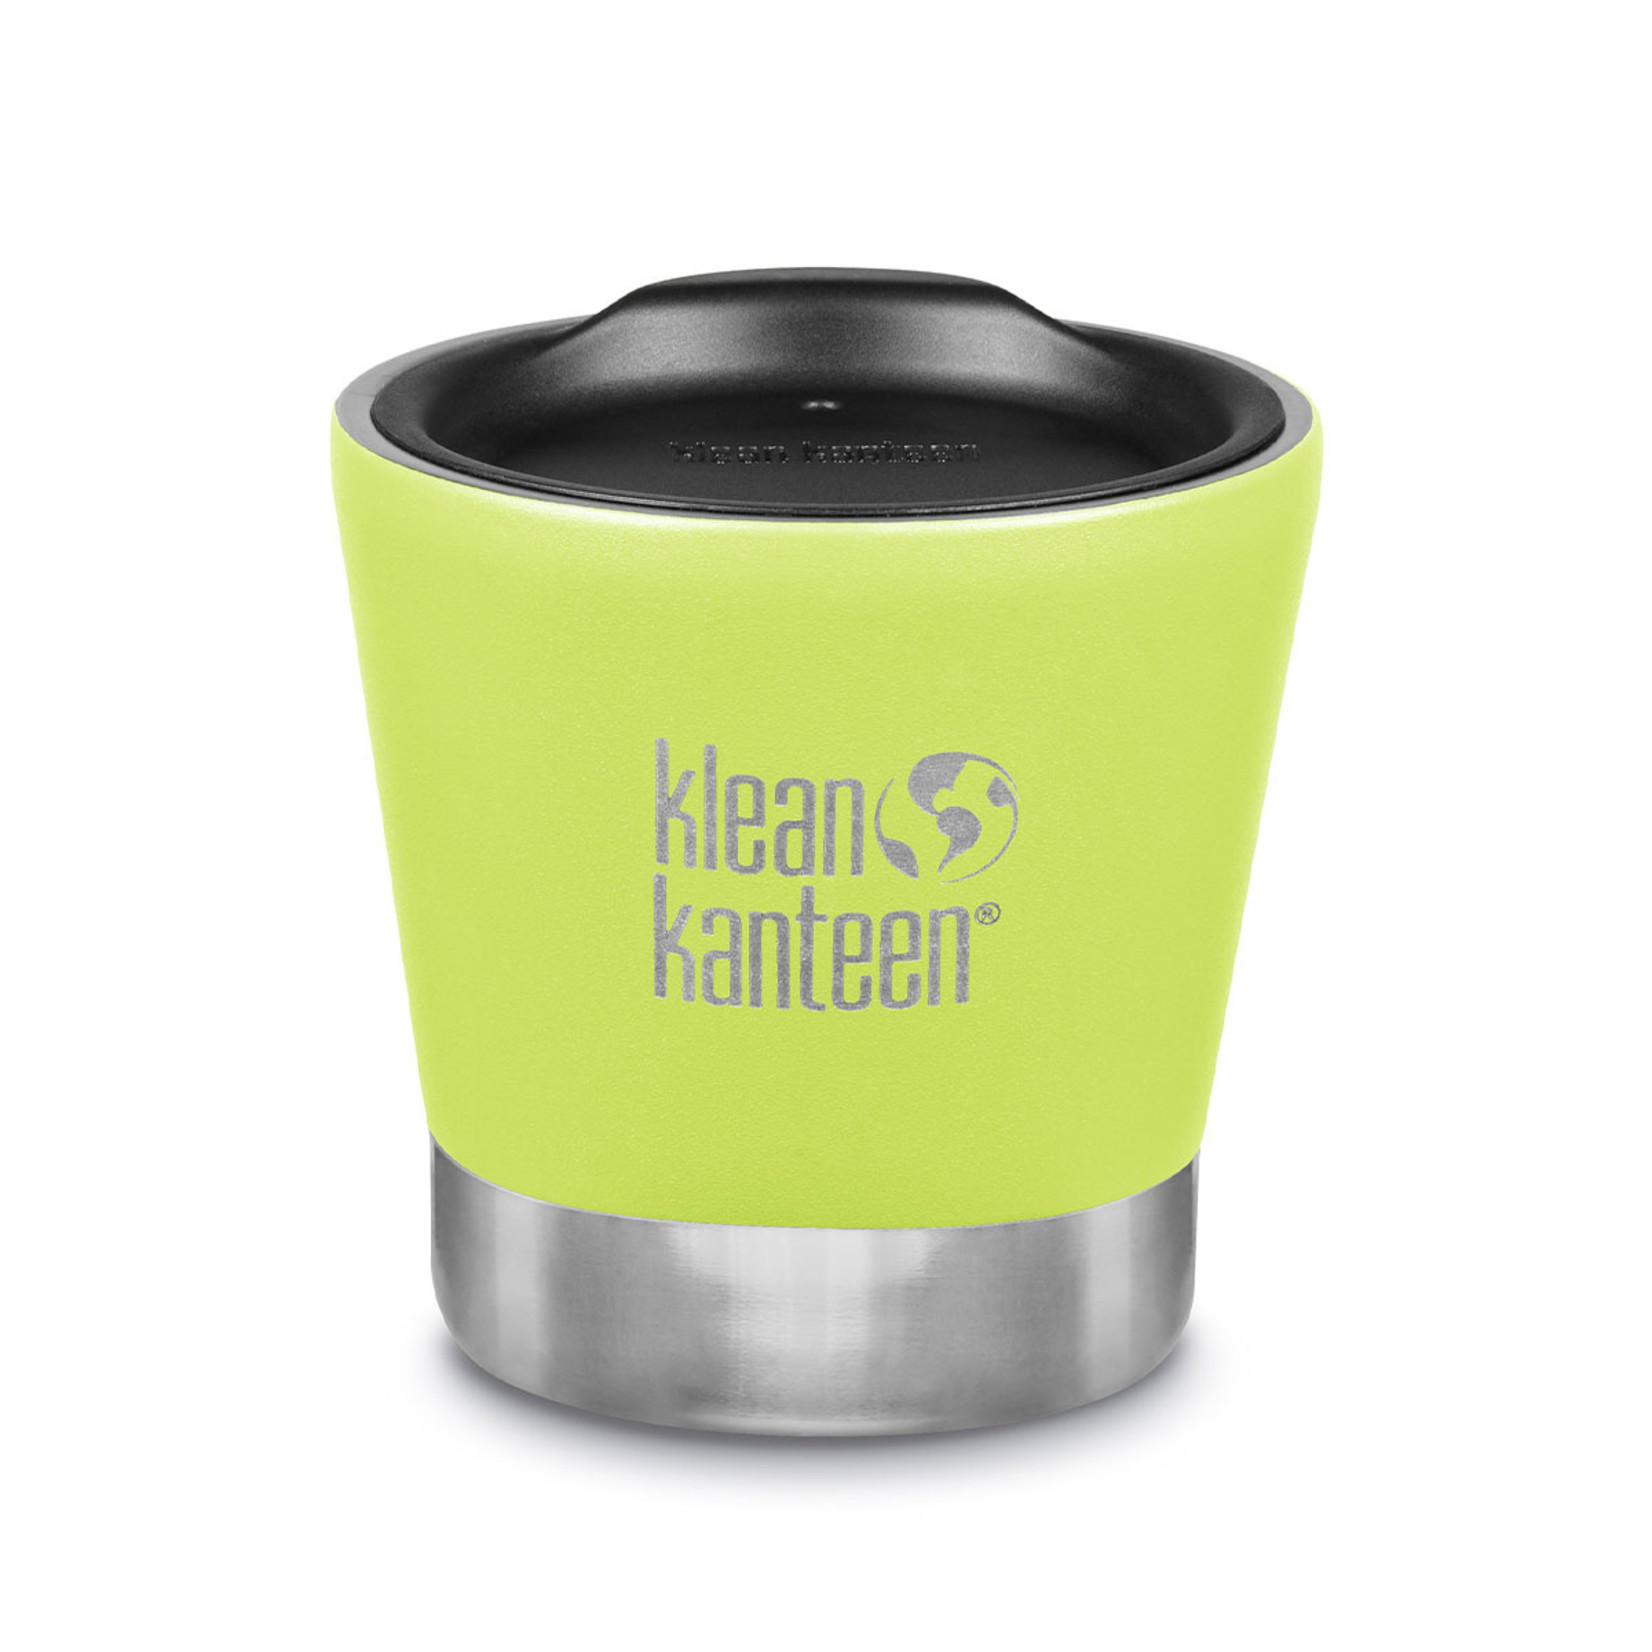 Klean Kanteen Klean Kanteen, Insulated Tumbler 8oz (237ml)